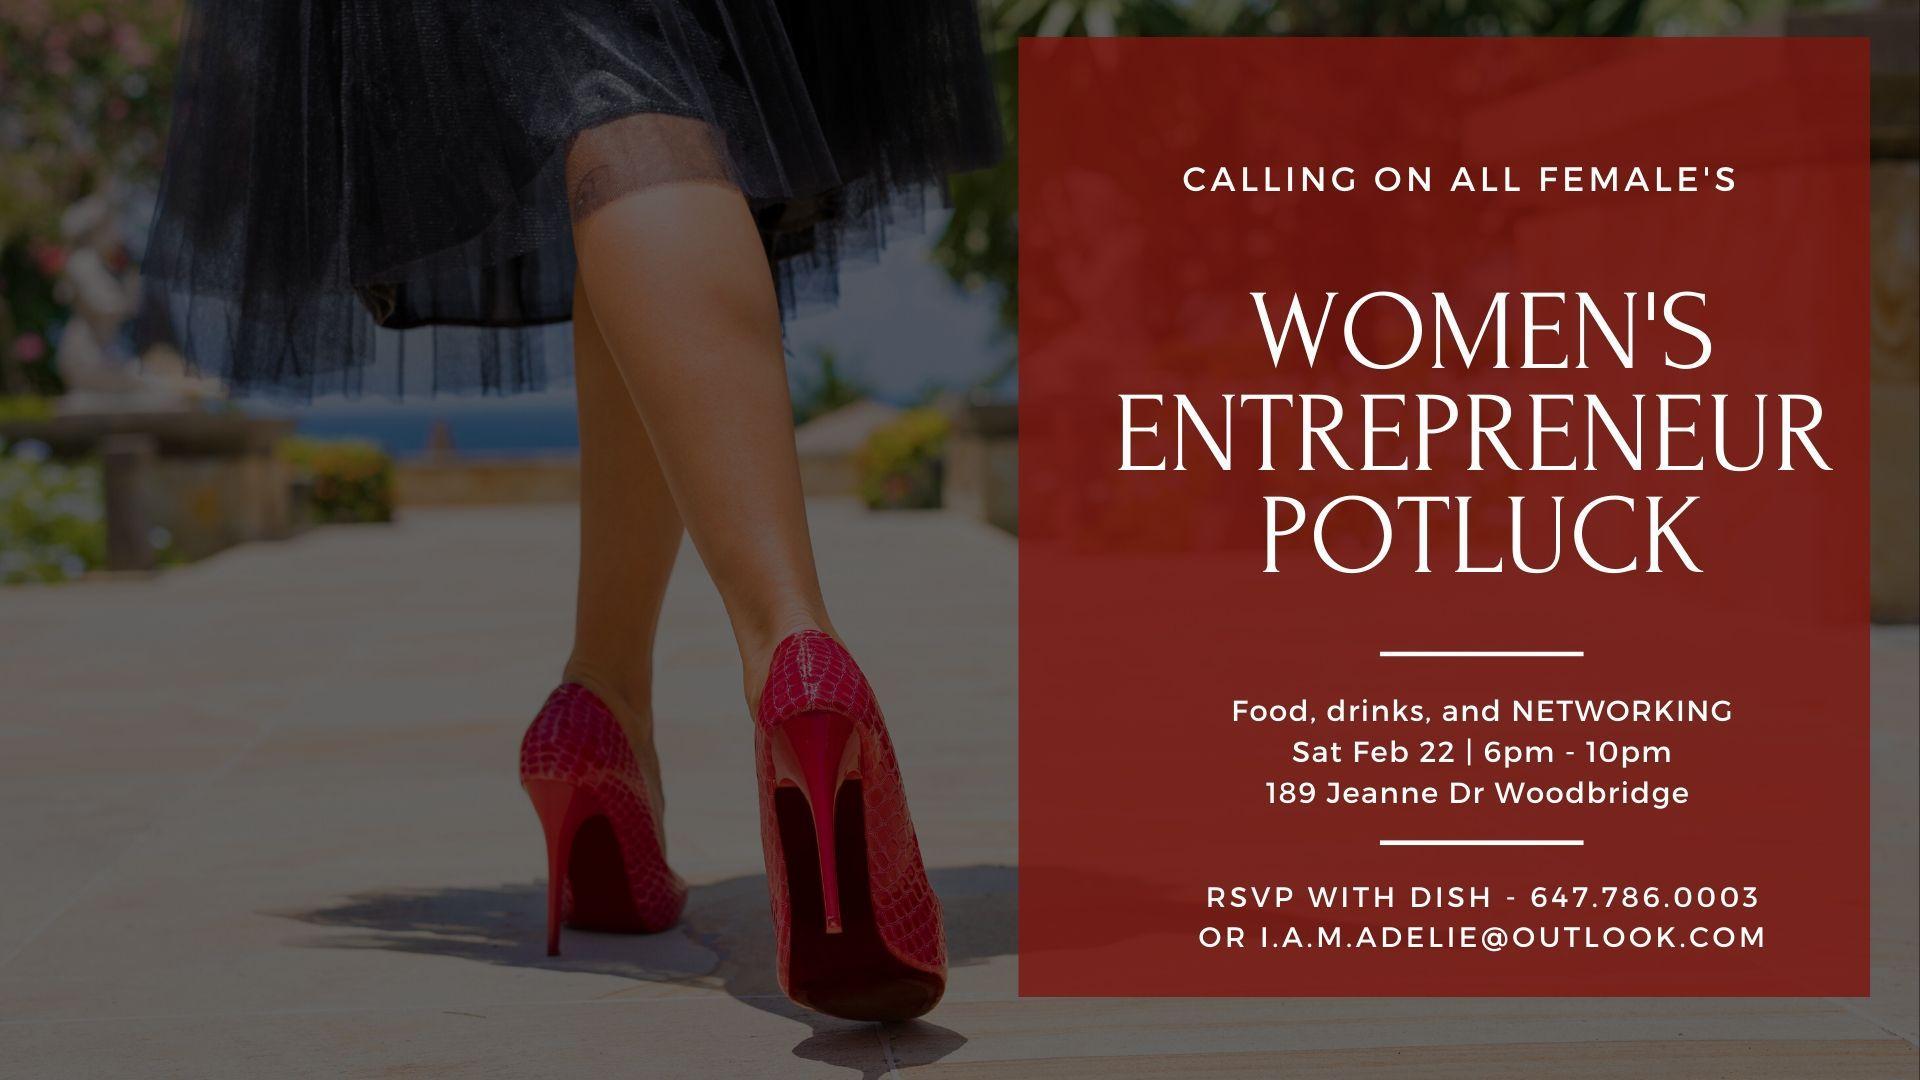 Women's Entrepreneur Potluck - FREE EVENT